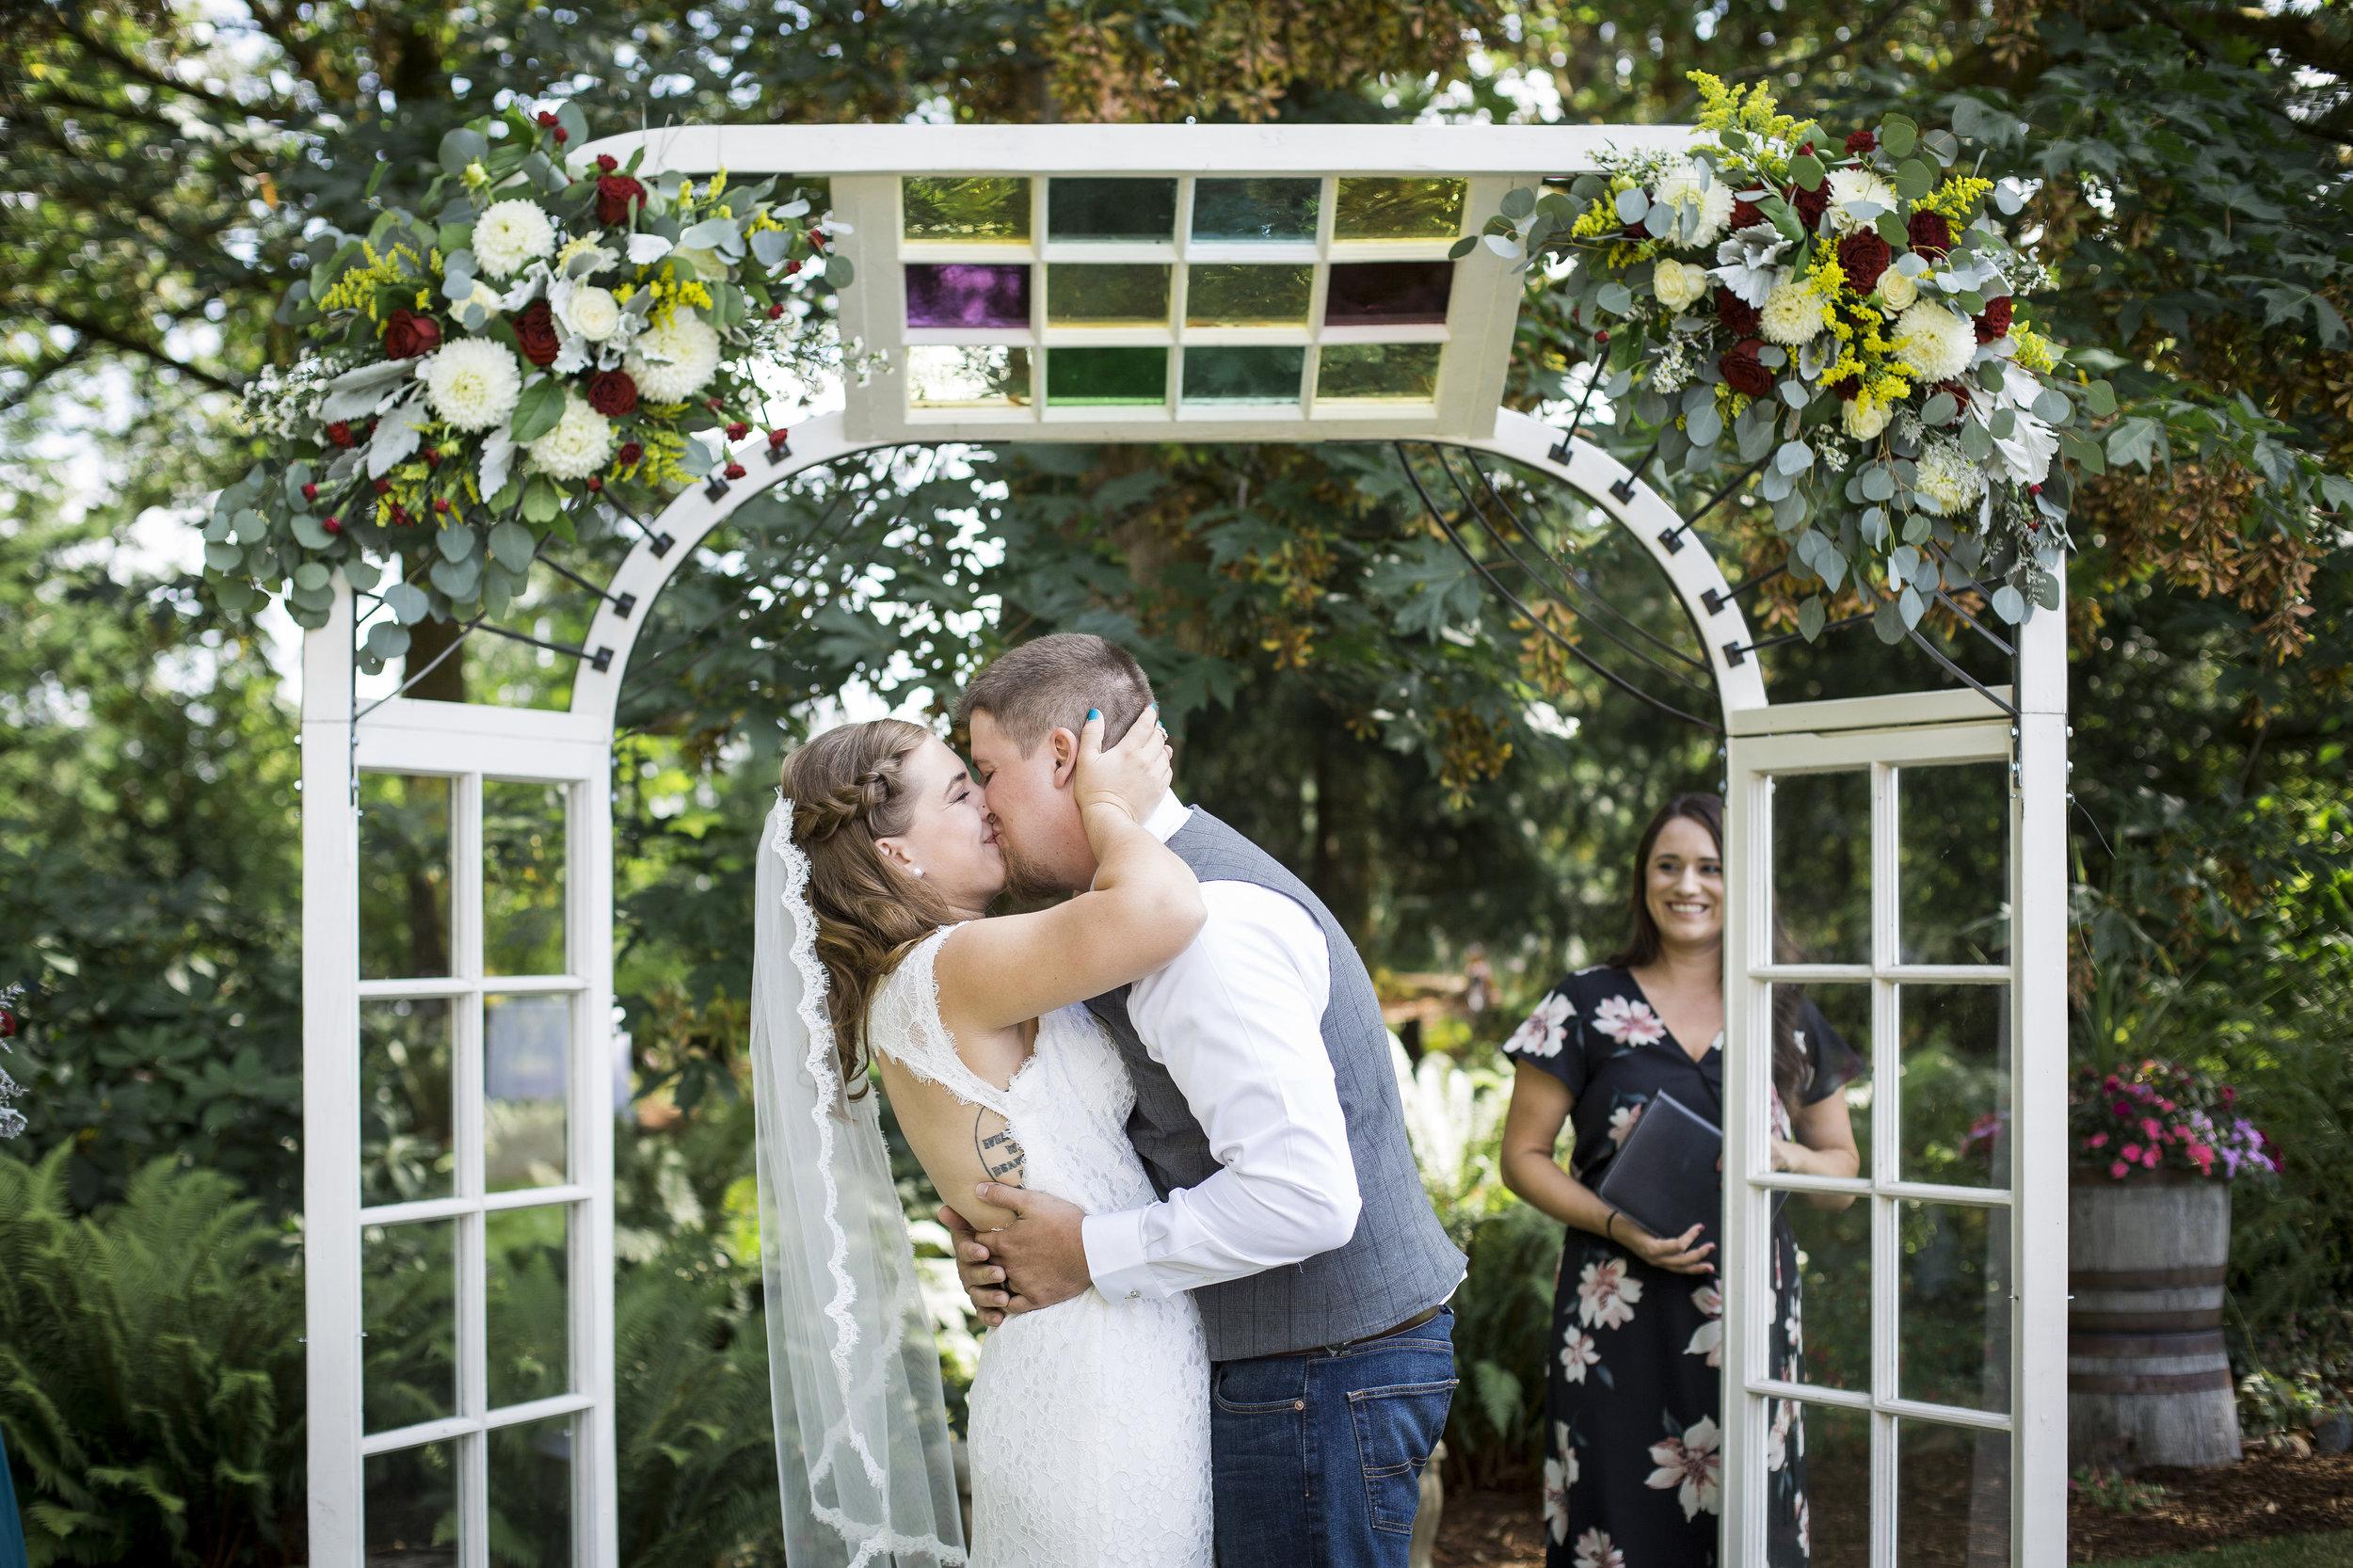 Seattle-Tacoma-Wedding-Photographer-Jaeda-Reed-JCW01.jpg